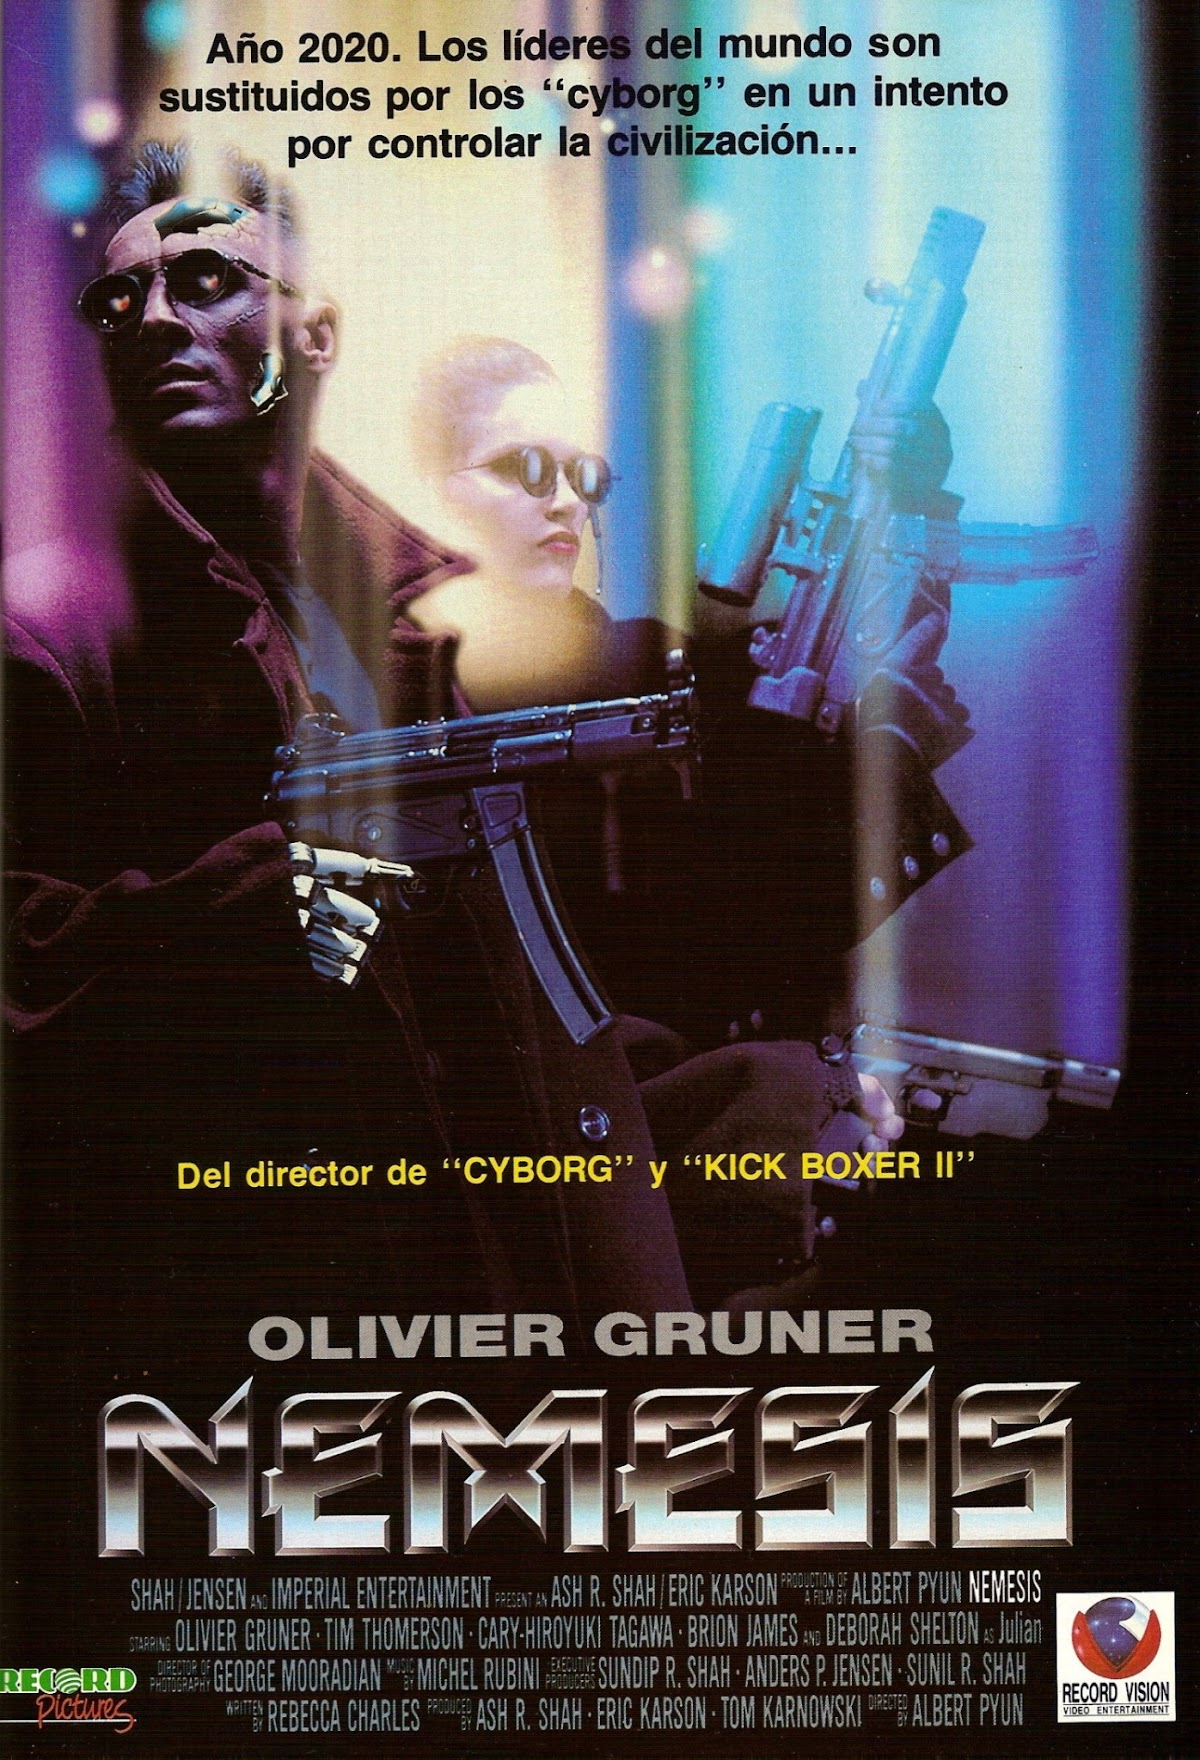 http://2.bp.blogspot.com/-O4vPlM8ywJQ/UeMdX-AvIfI/AAAAAAAABVk/KBcvkT8_OGo/s1760/Nemesis+poster+espa%C3%B1ol+1992.jpg